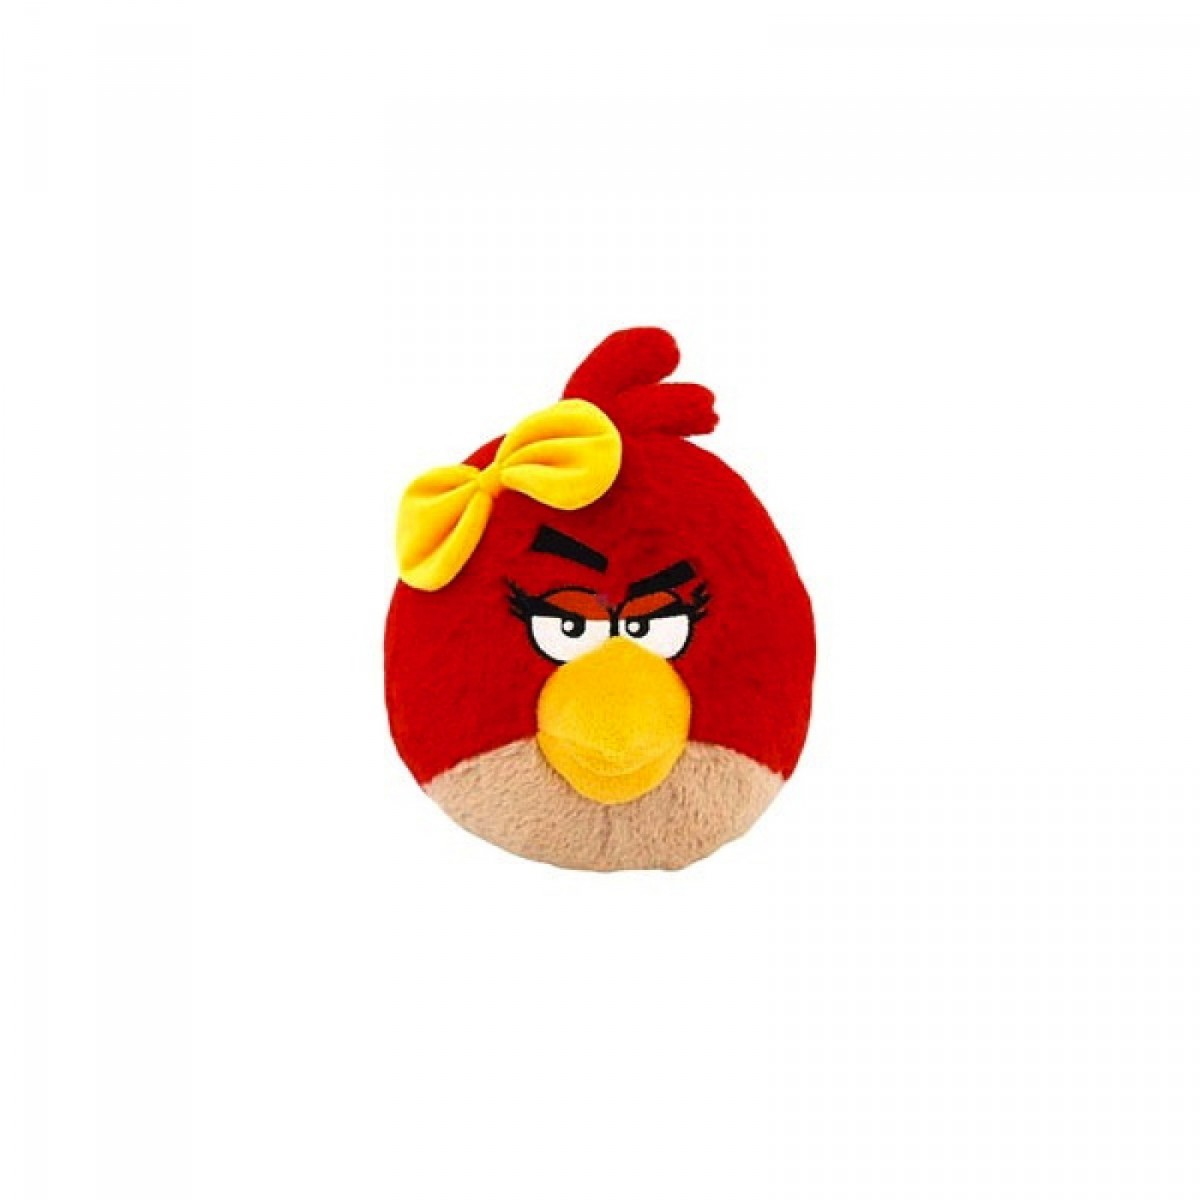 Angry Birds  Piros lány madár 13 cm-es plüssfigura 18220ab098